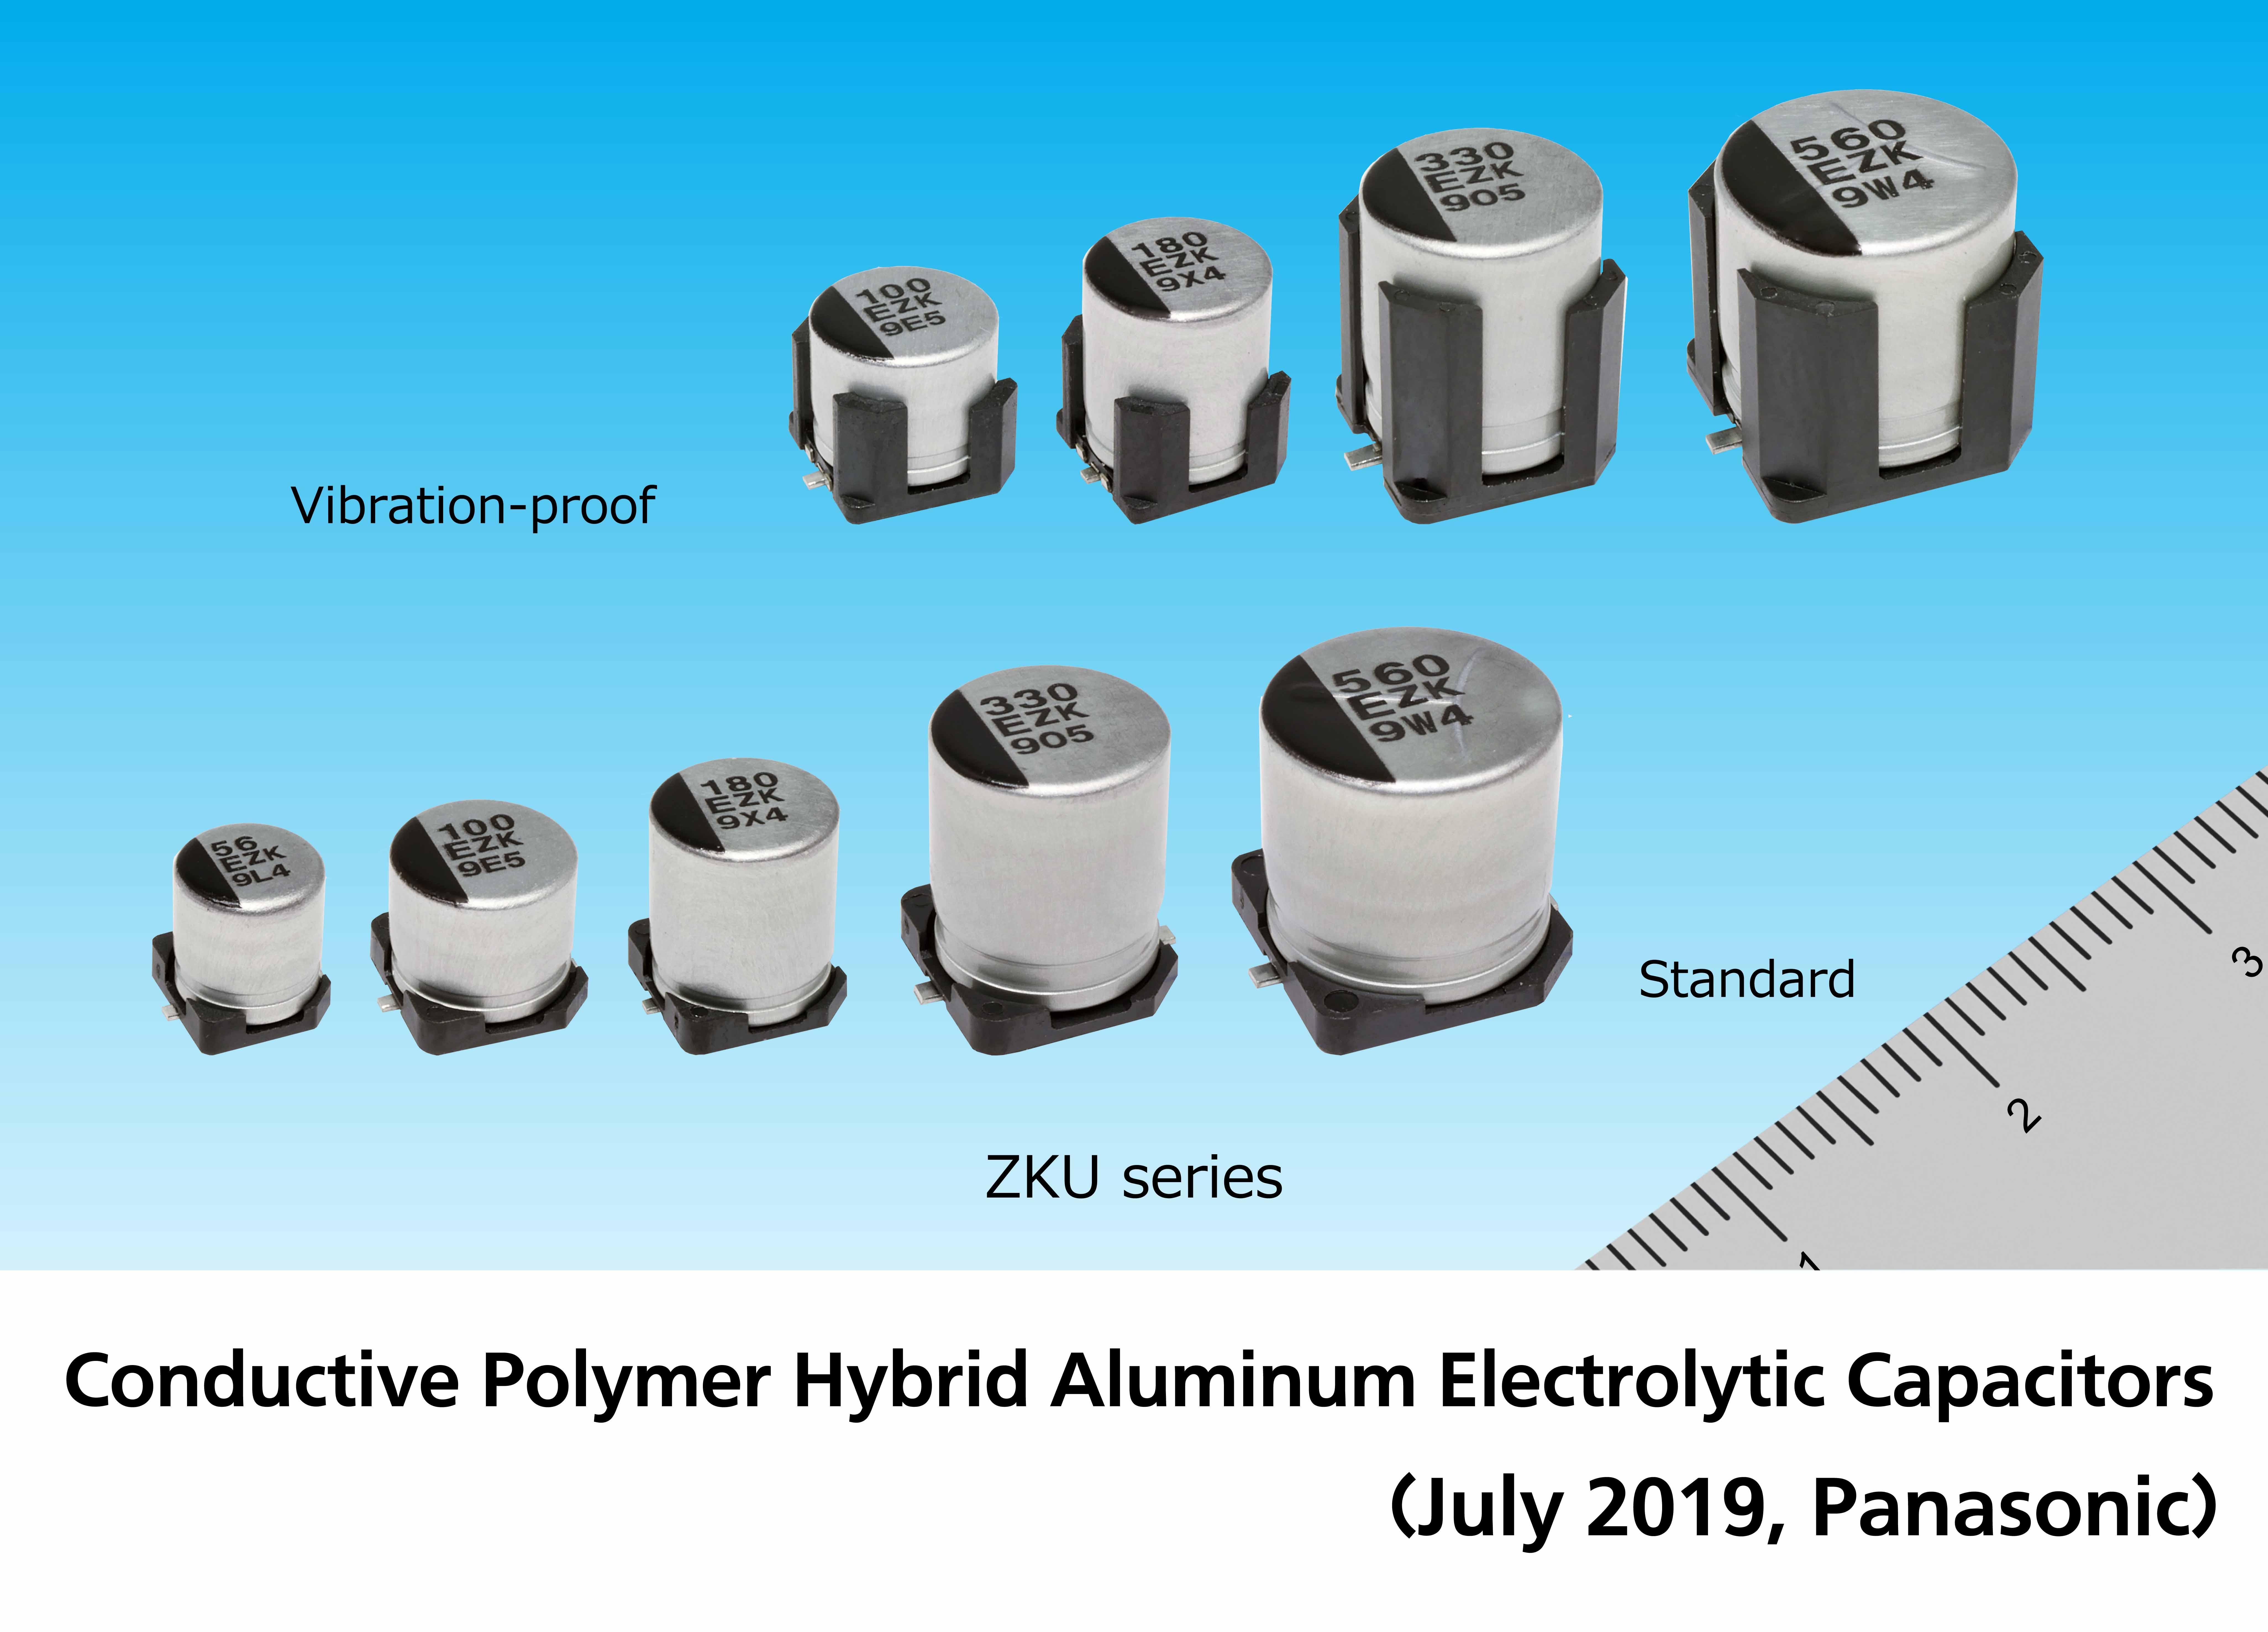 Panasonic Commercializes New ZKU Series Conductive Polymer